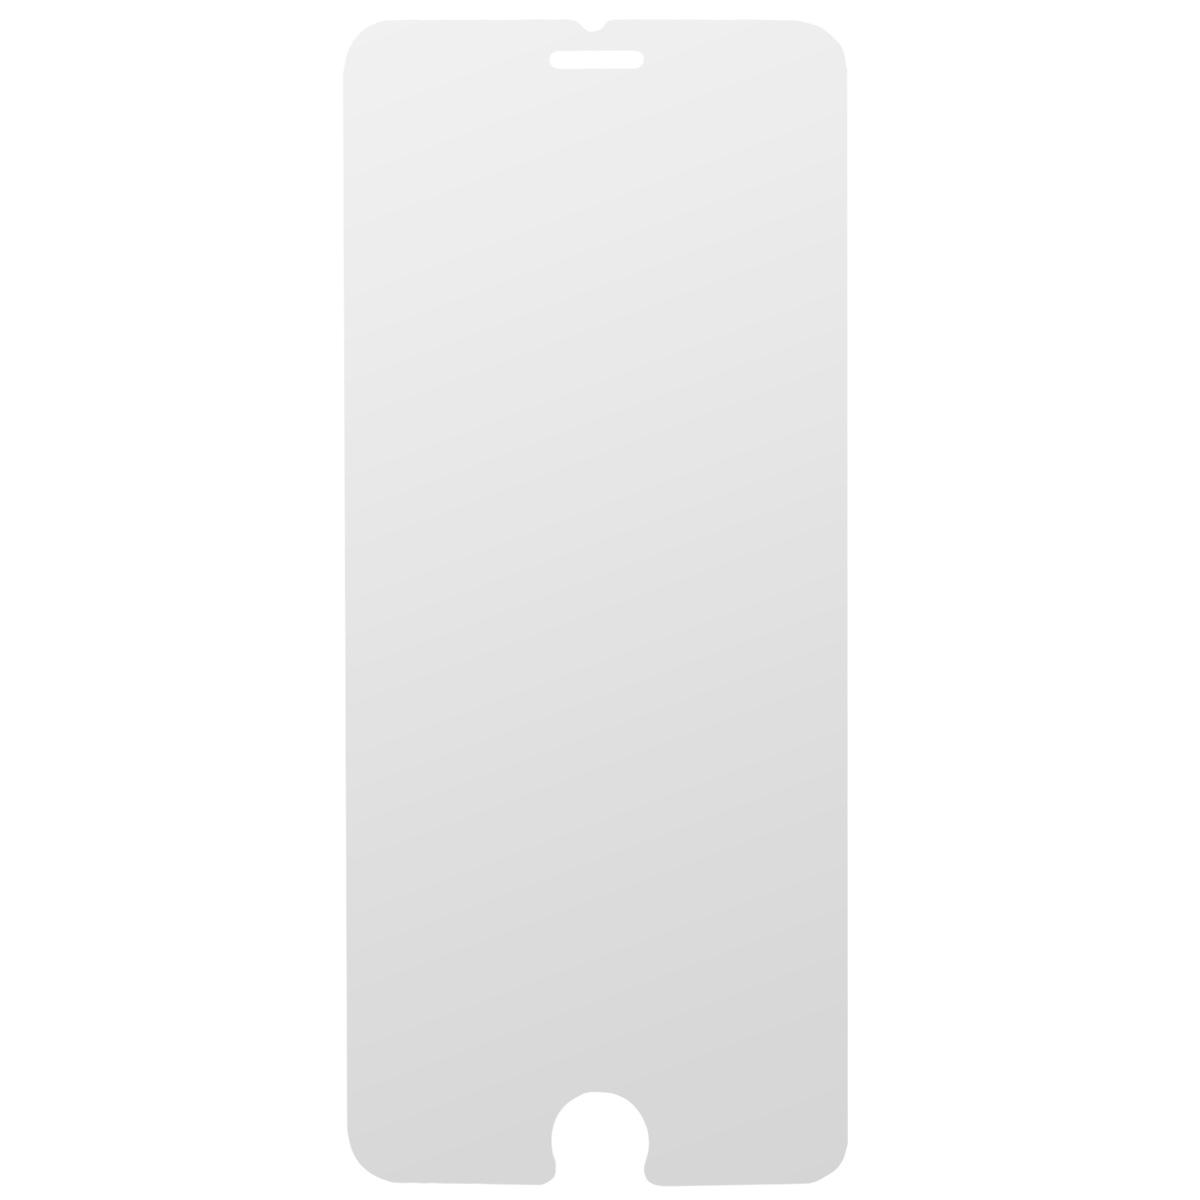 Highscreen защитное стекло для iPhone 6 Plus, прозрачное highscreen защитное стекло для fest xl xl pro